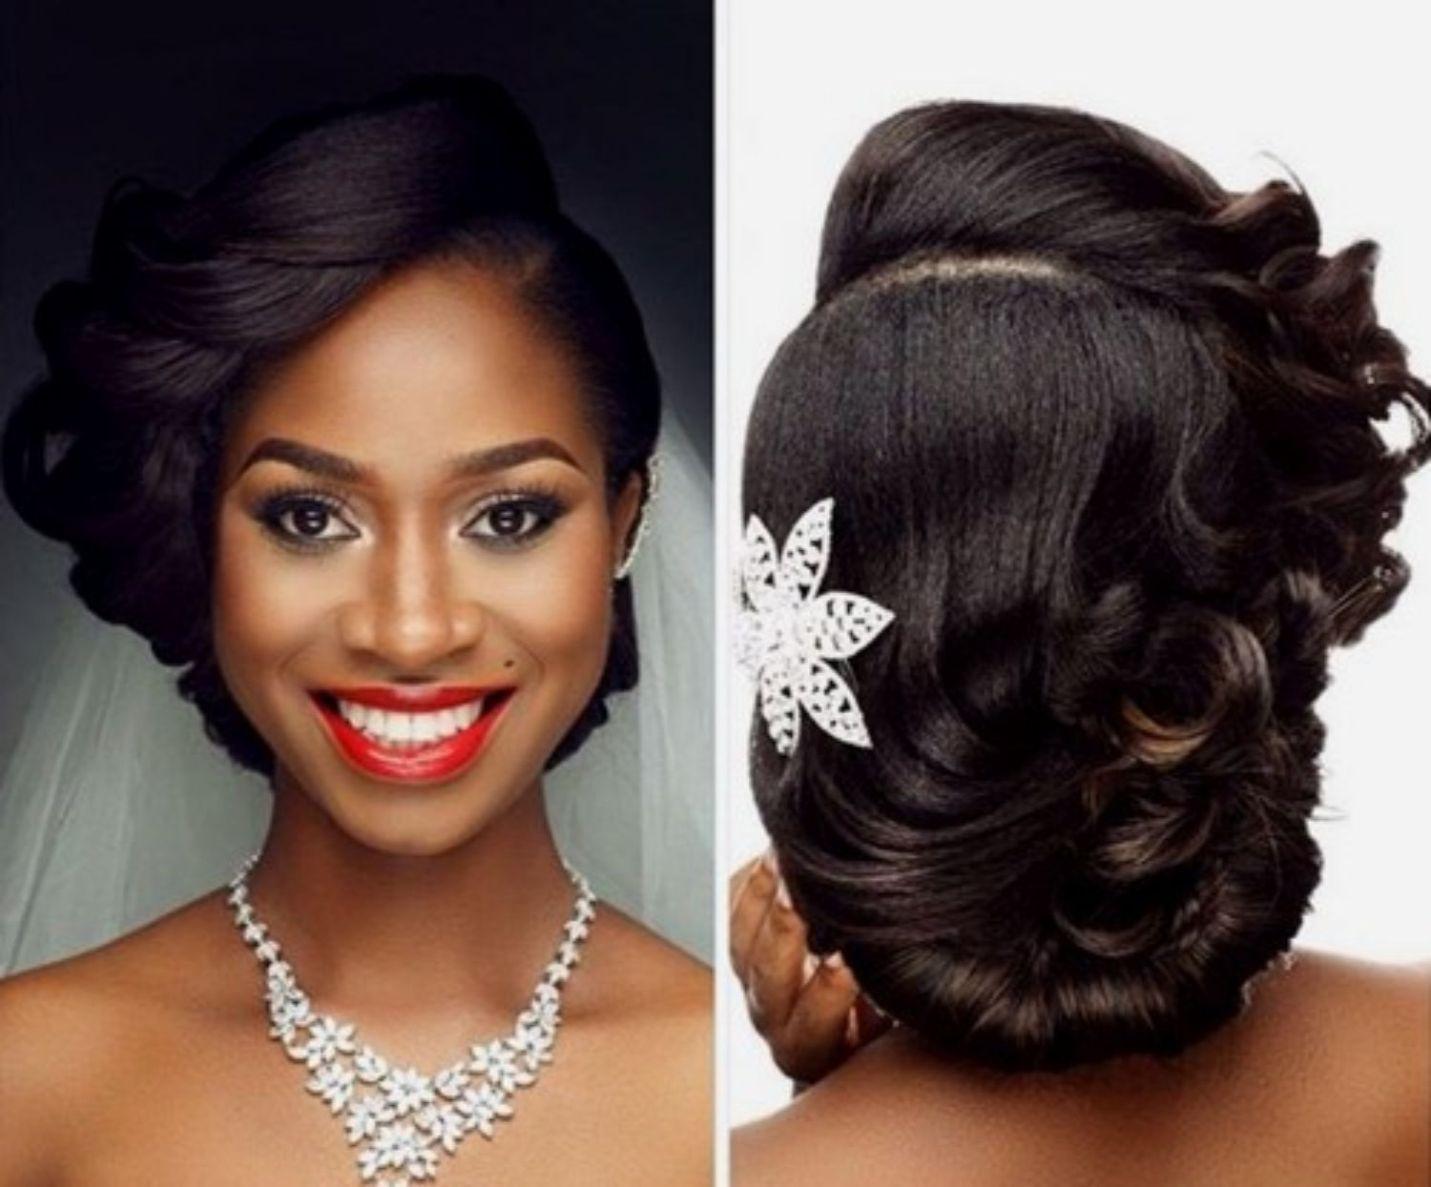 Black Wedding Hairstyles 20 Country - 20 superb black wedding ...